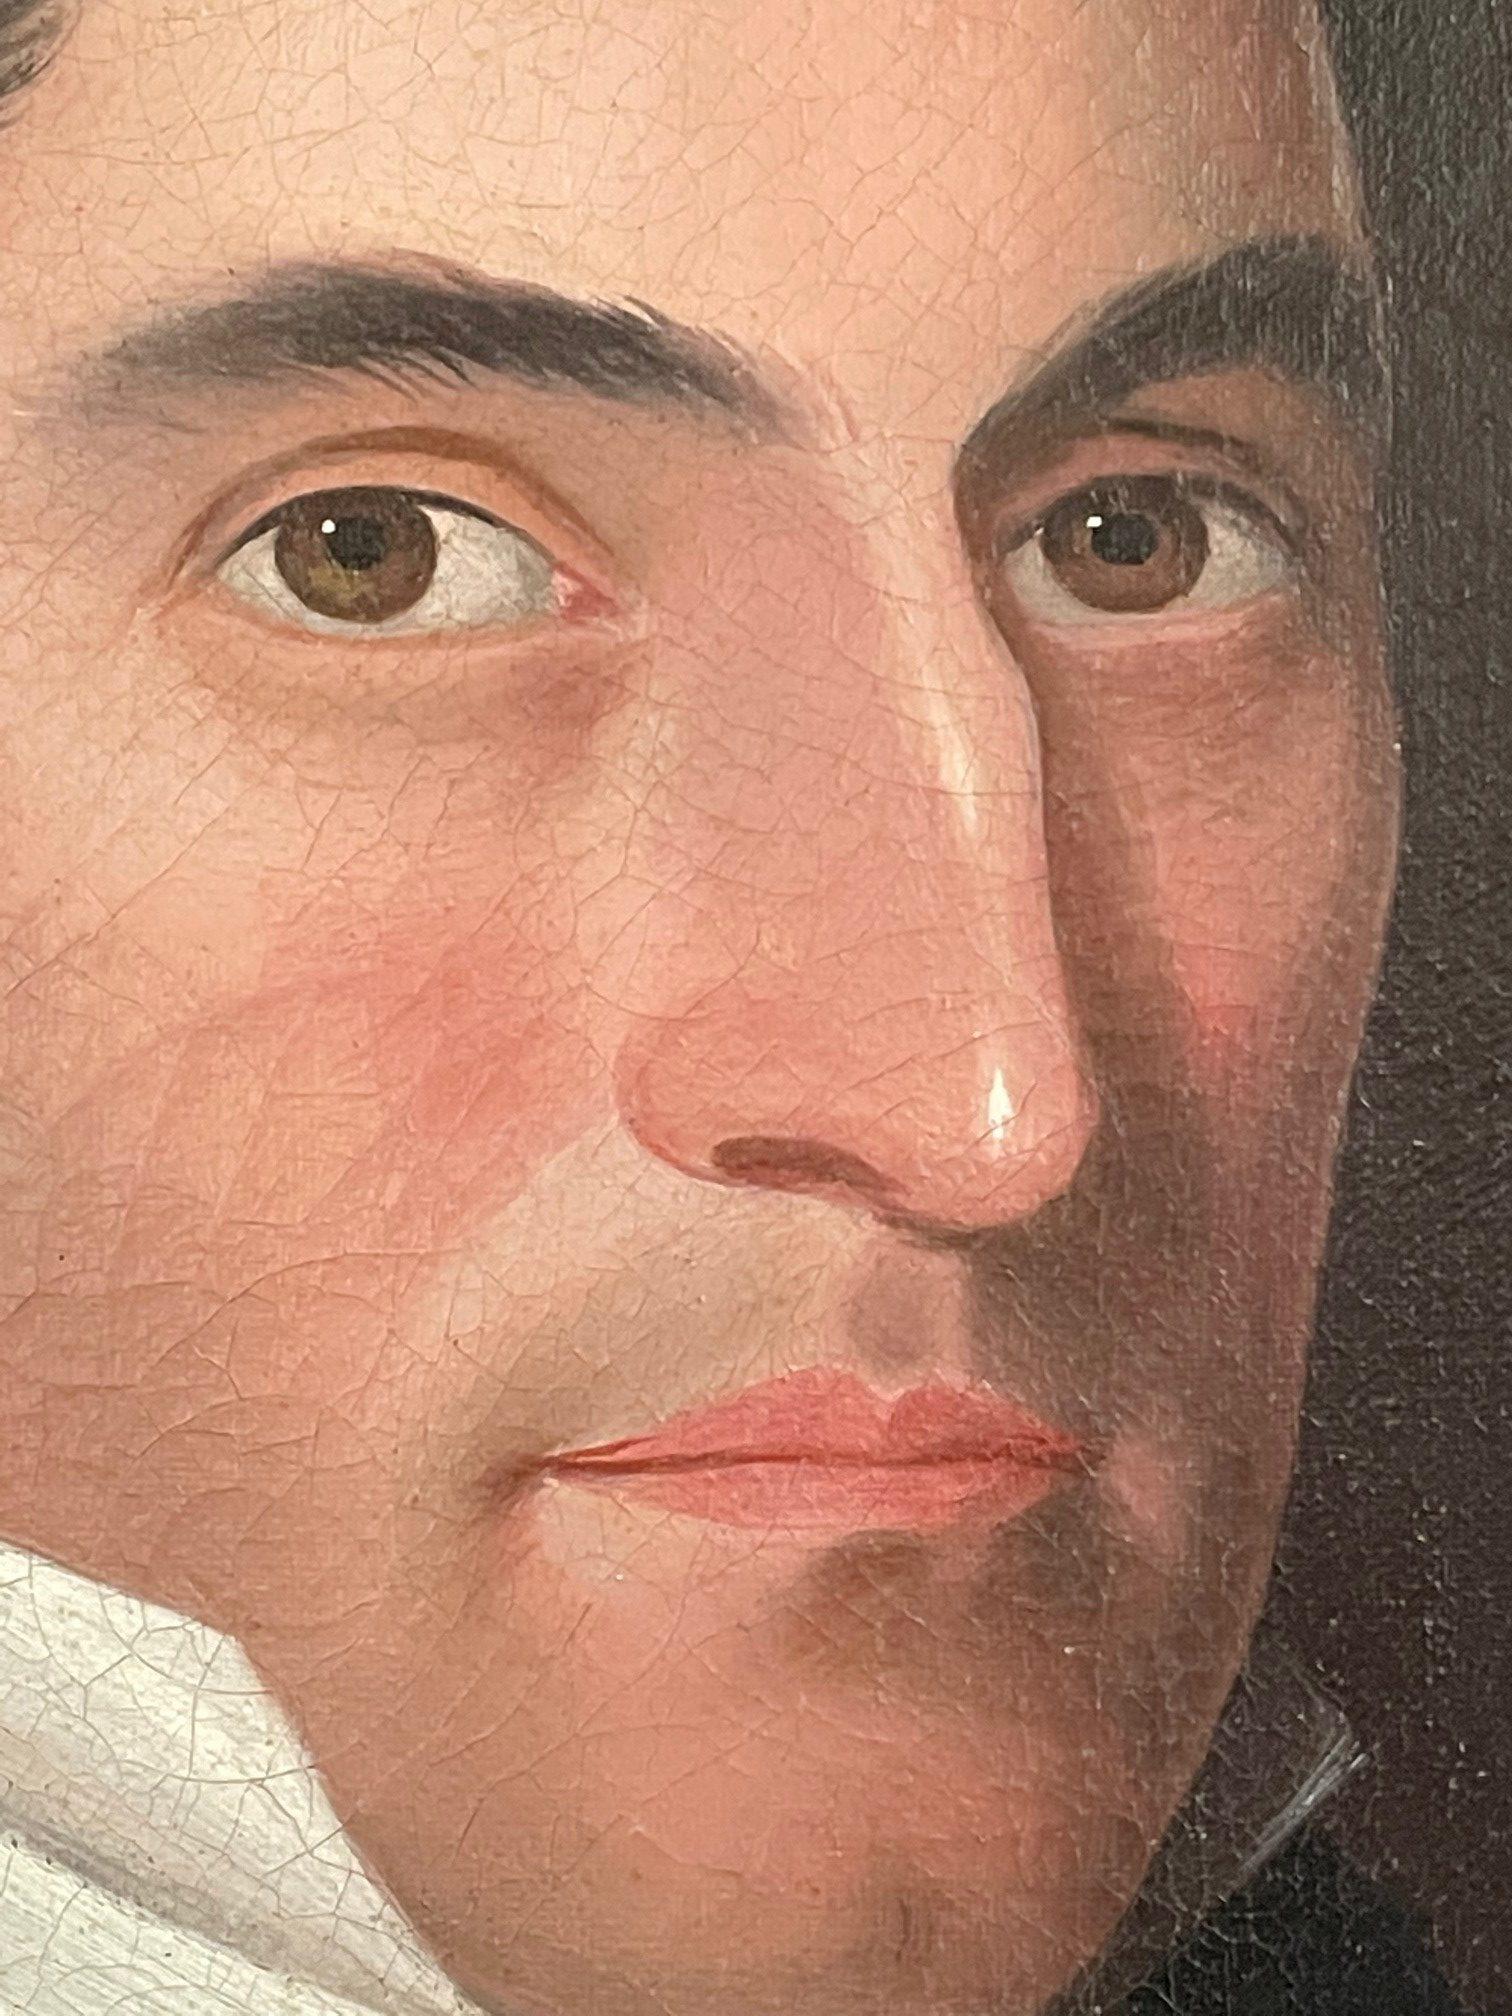 ammi phillips portrait of a man rel=